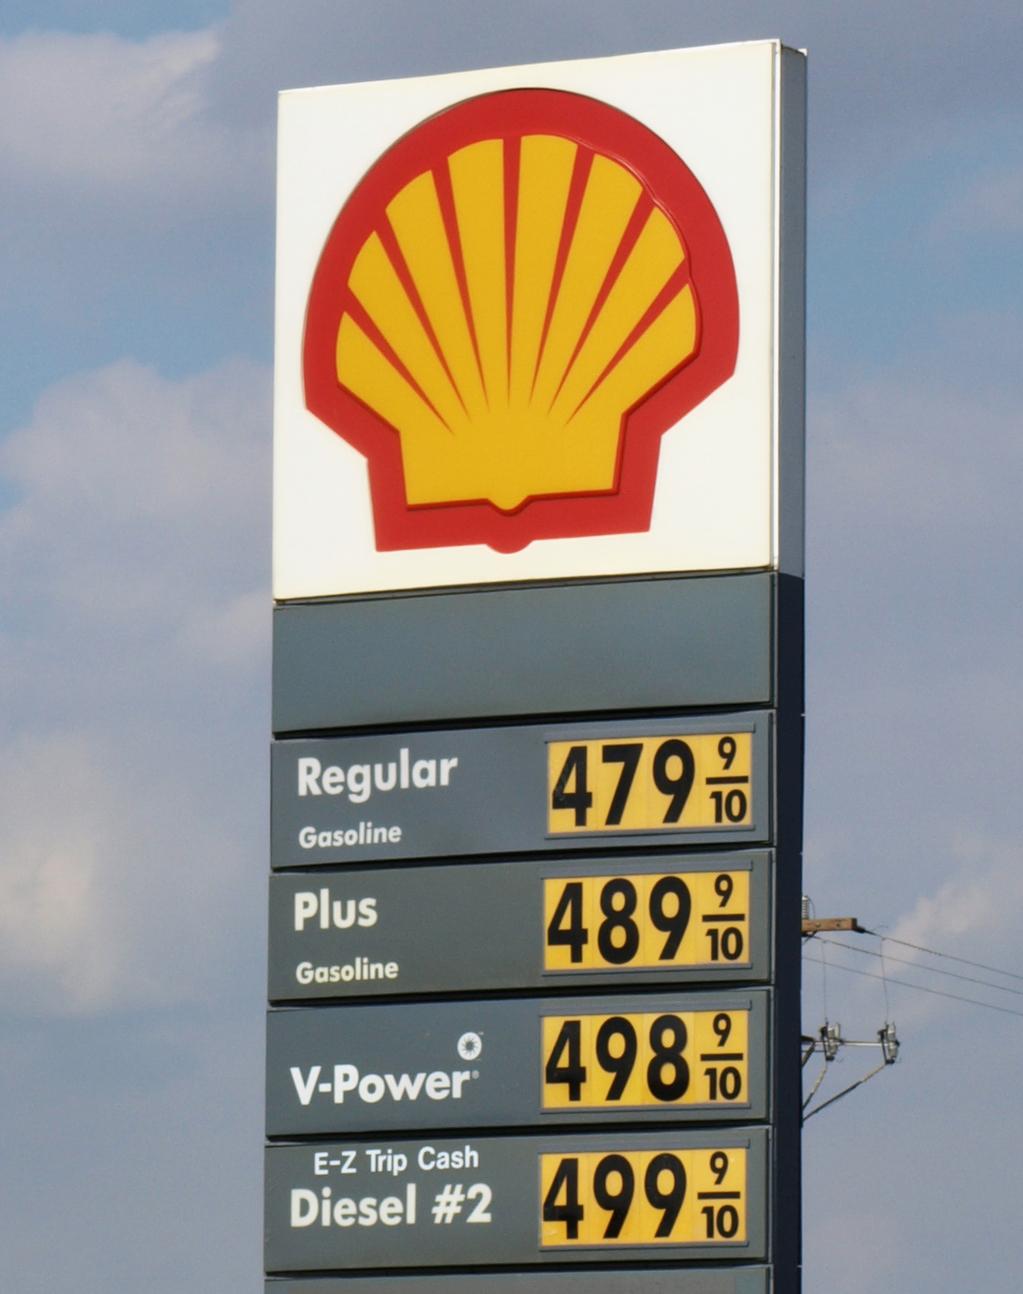 Regular gas